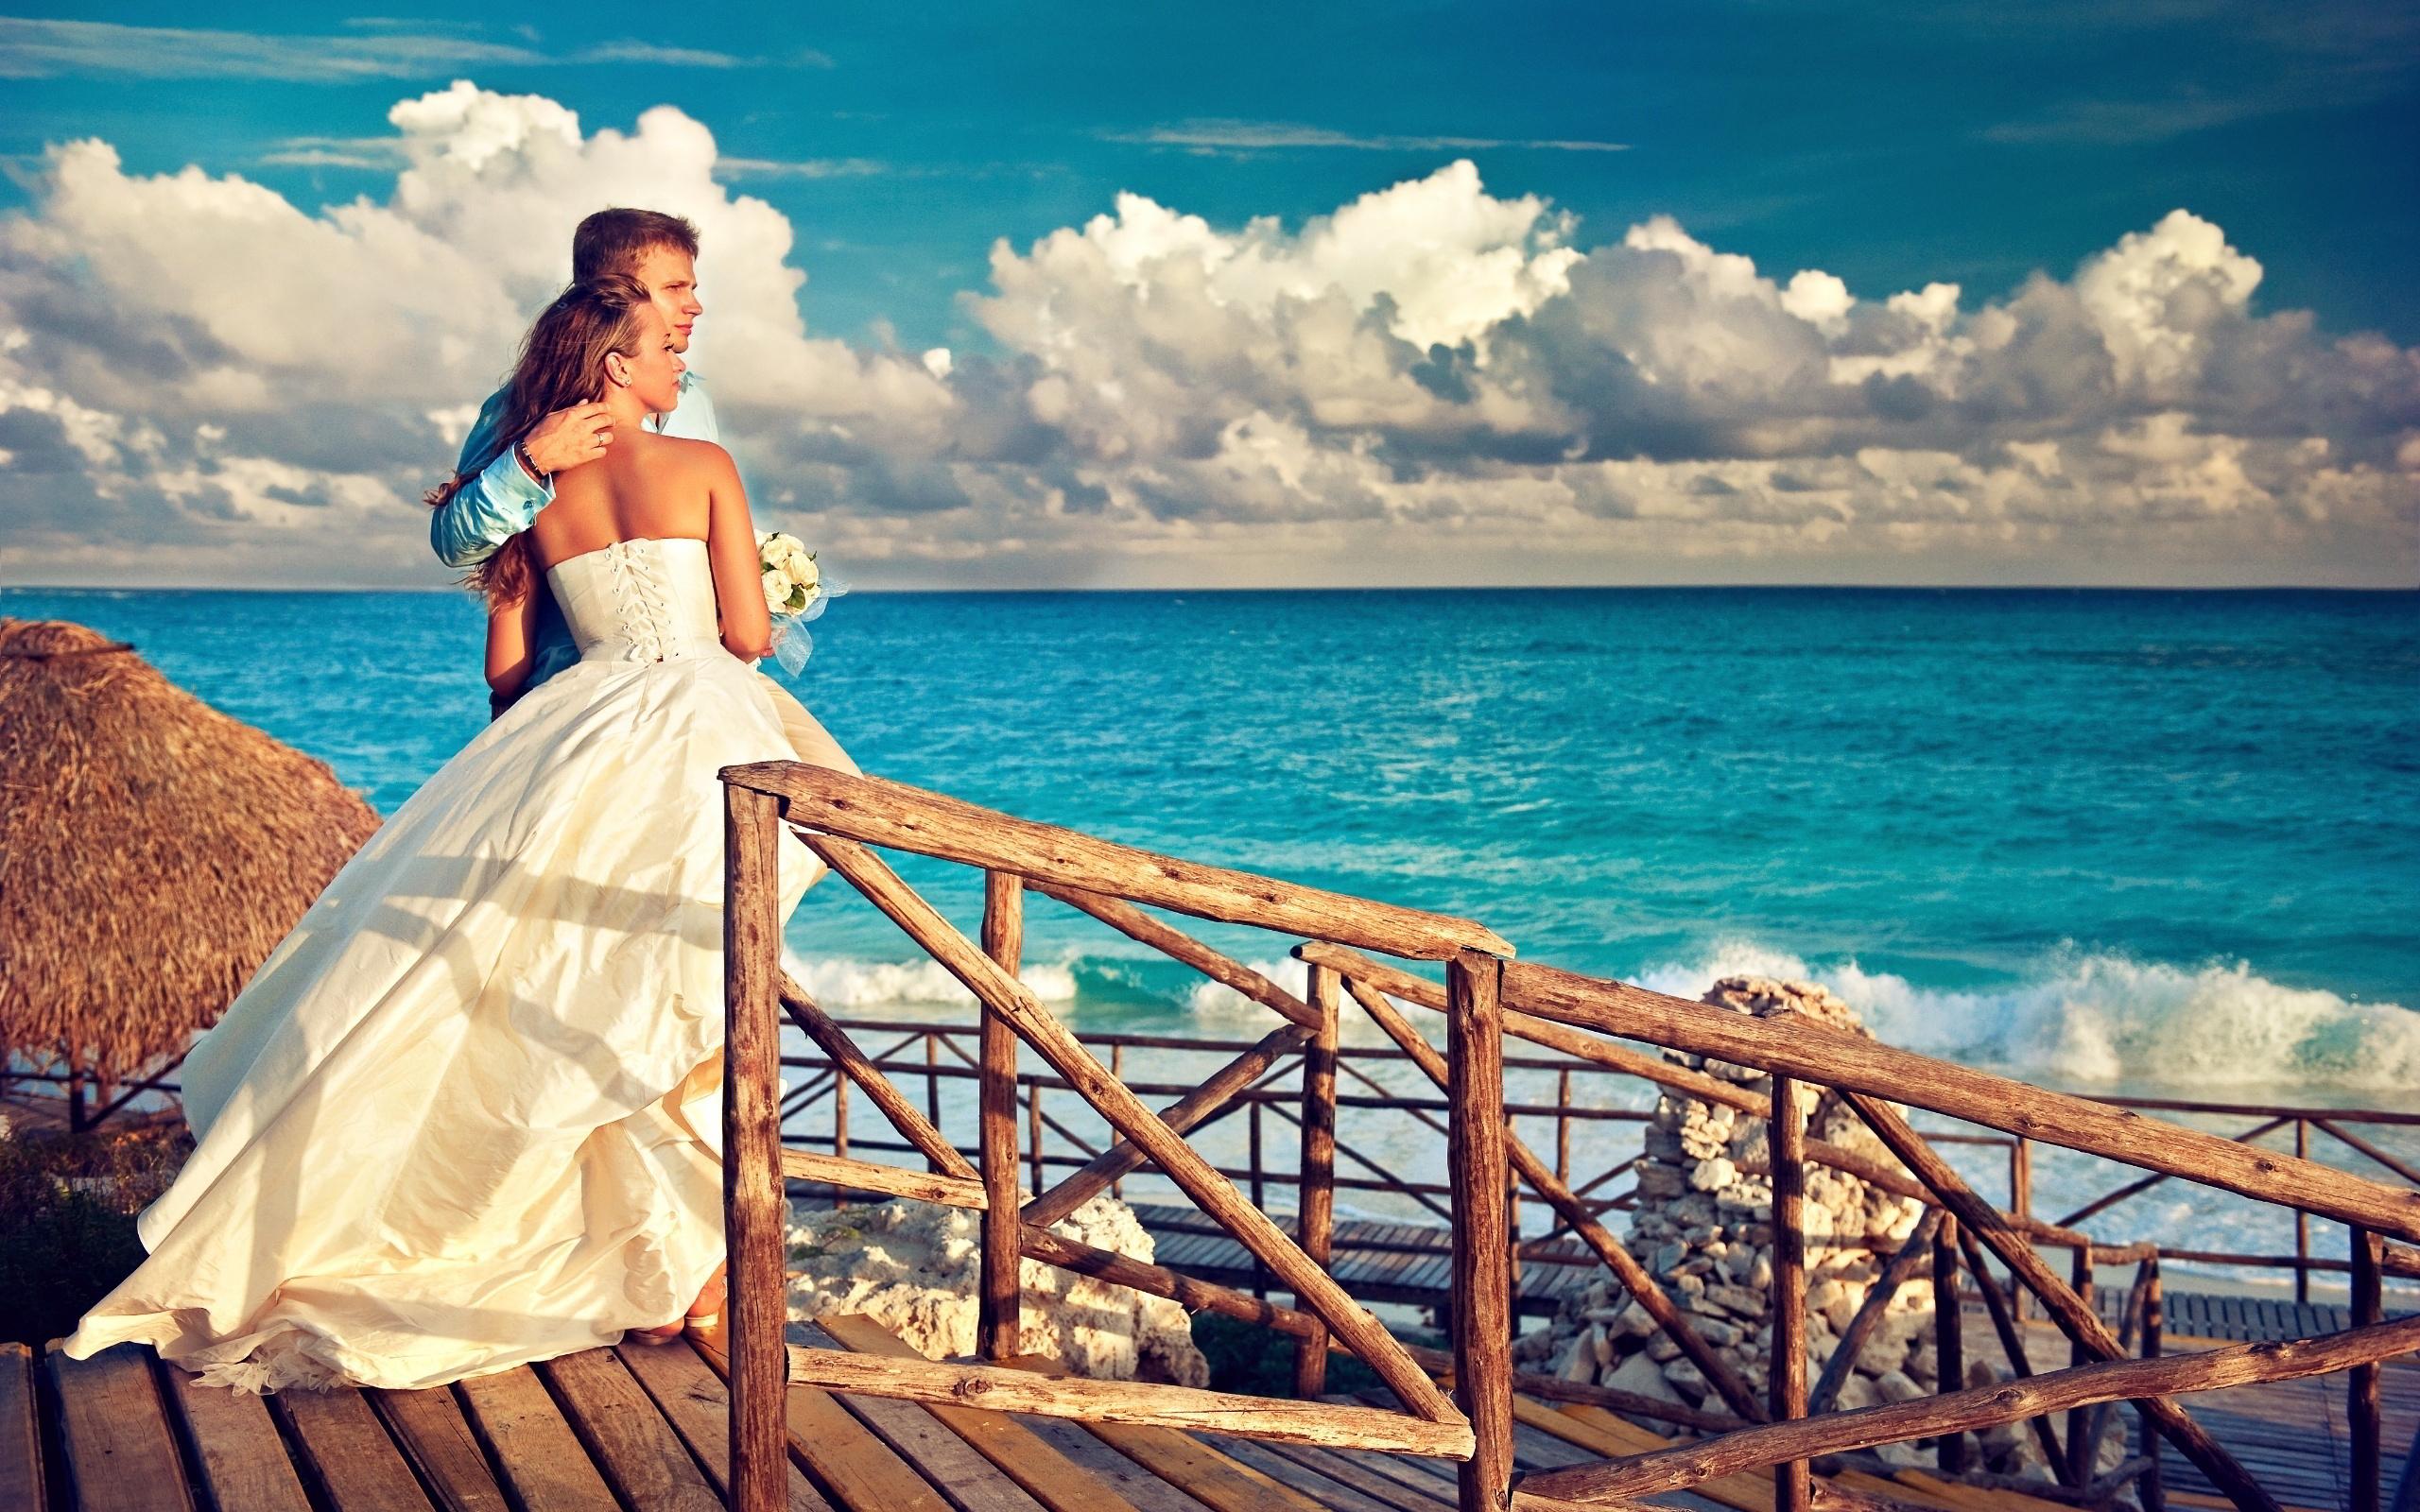 Bridal pair watch sunset